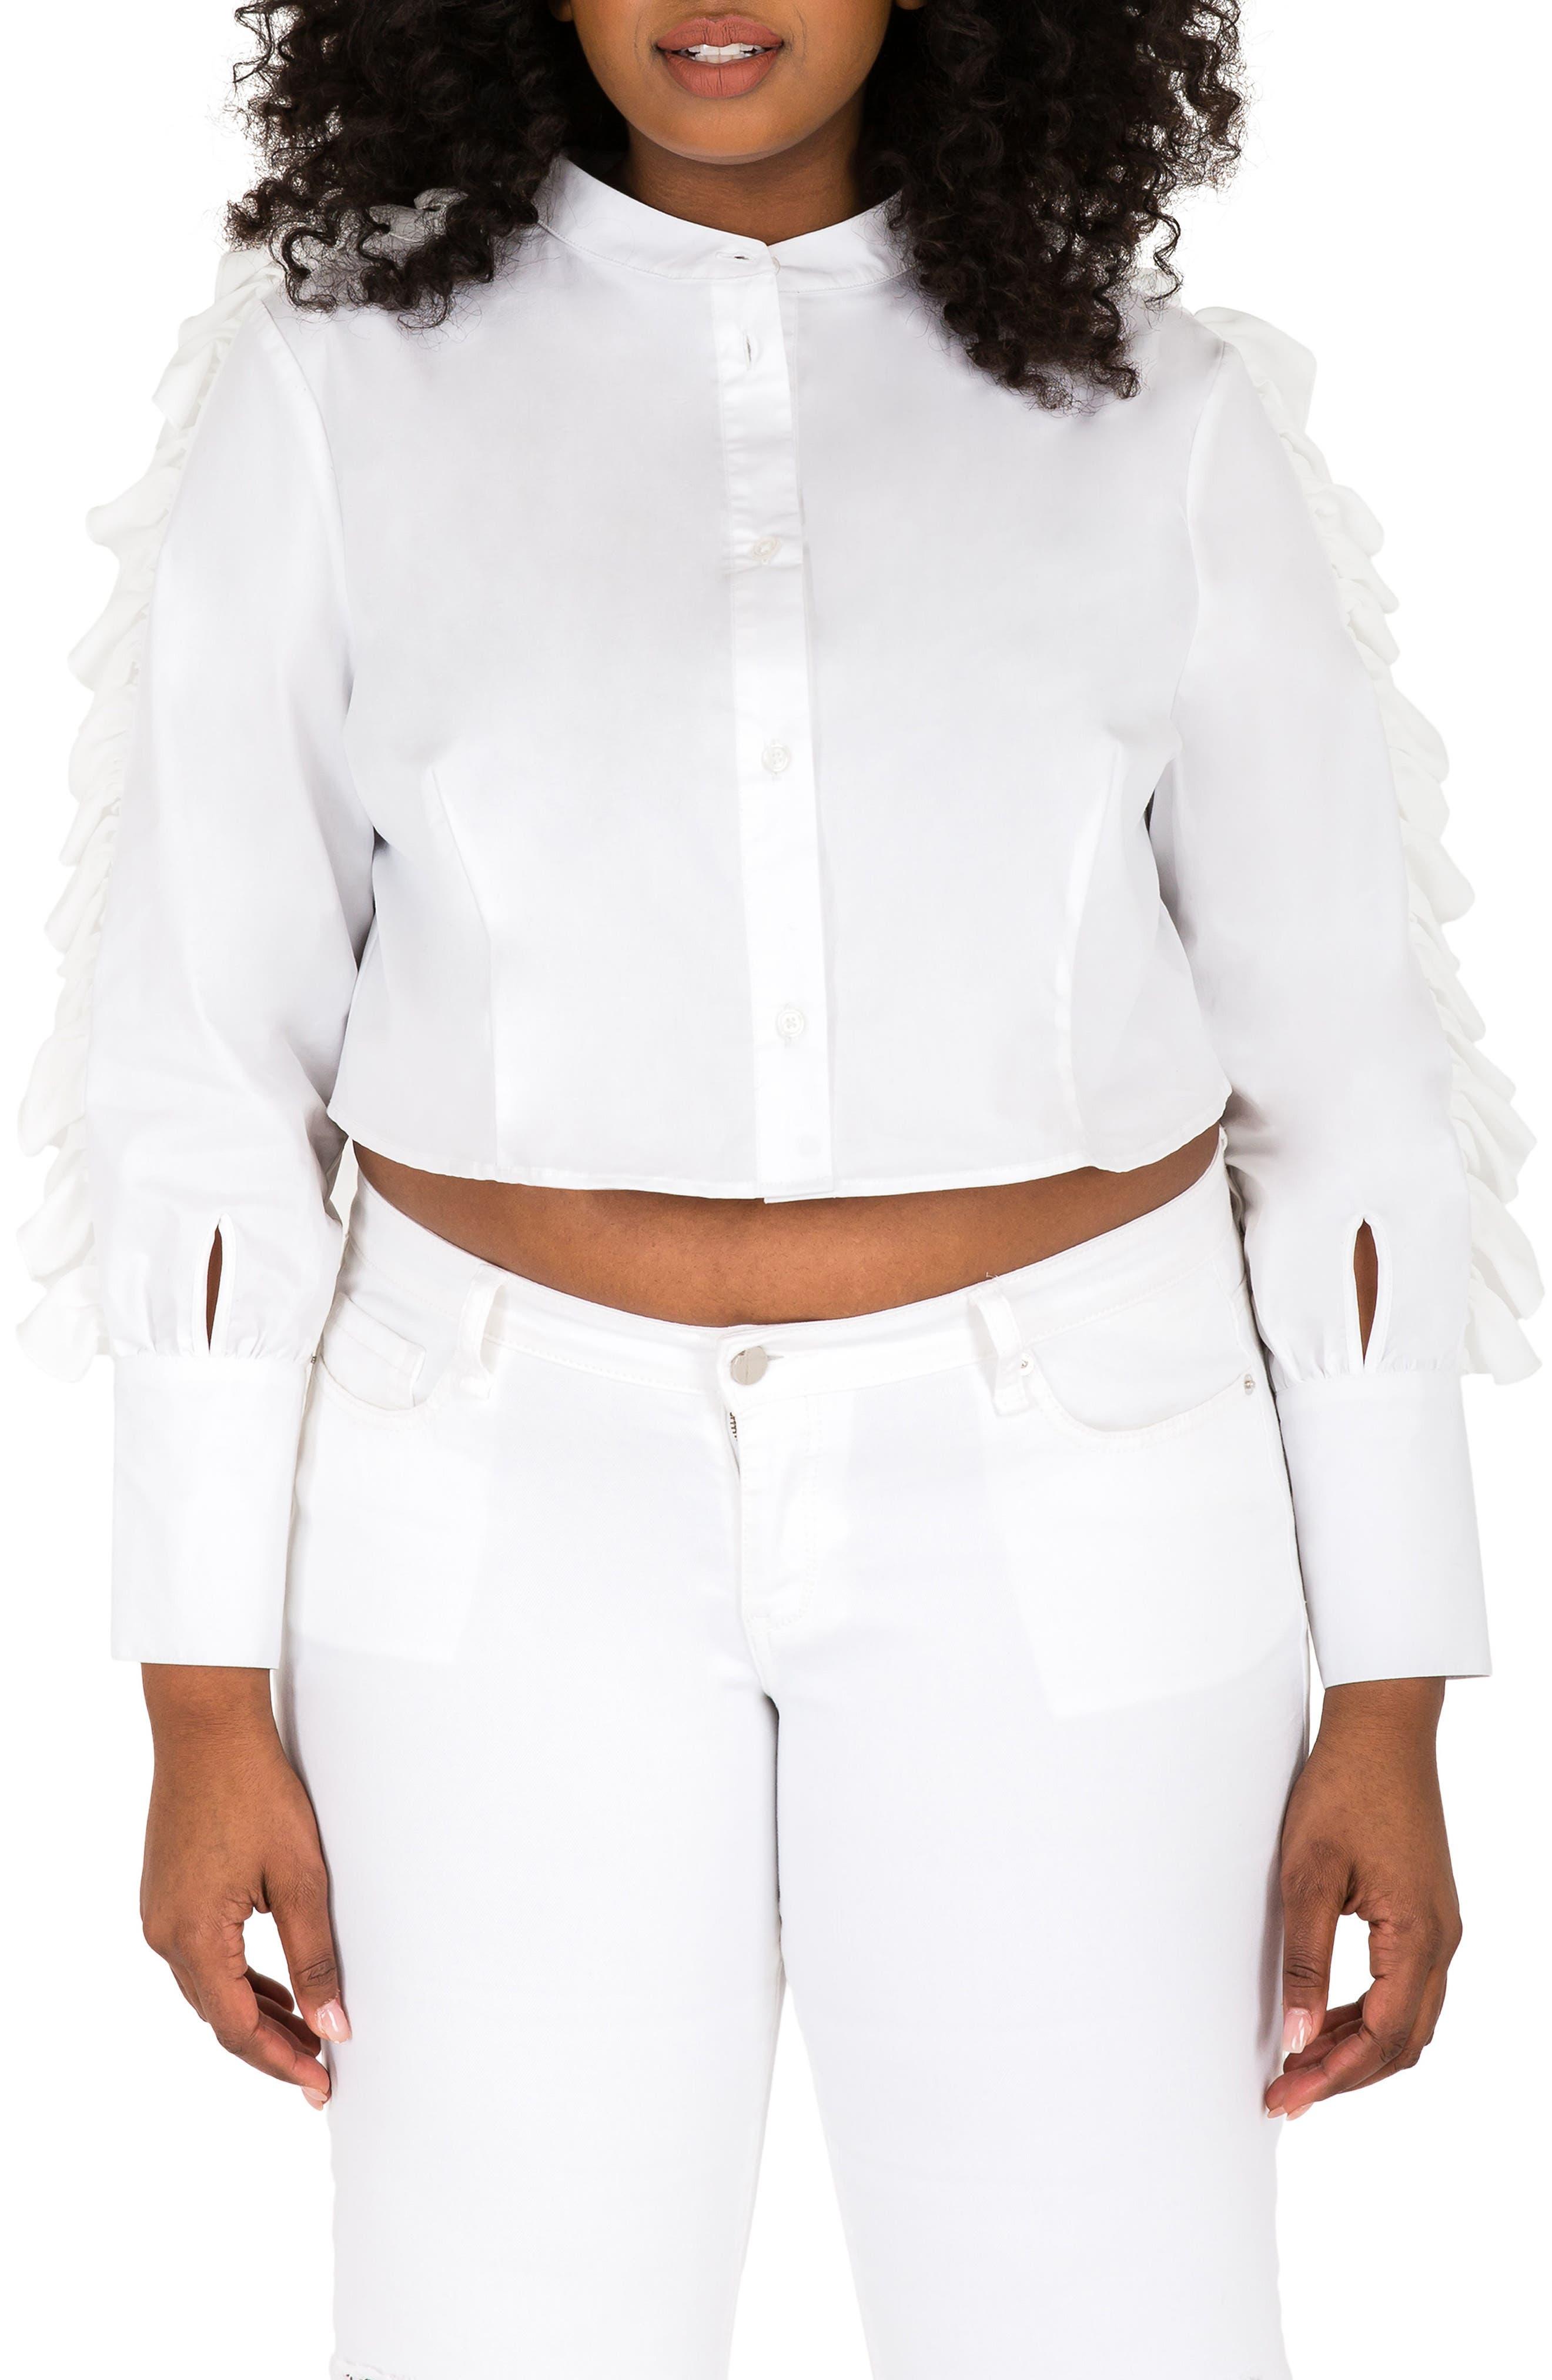 Mayasia Ruffle Sleeve Crop Shirt,                             Main thumbnail 1, color,                             White